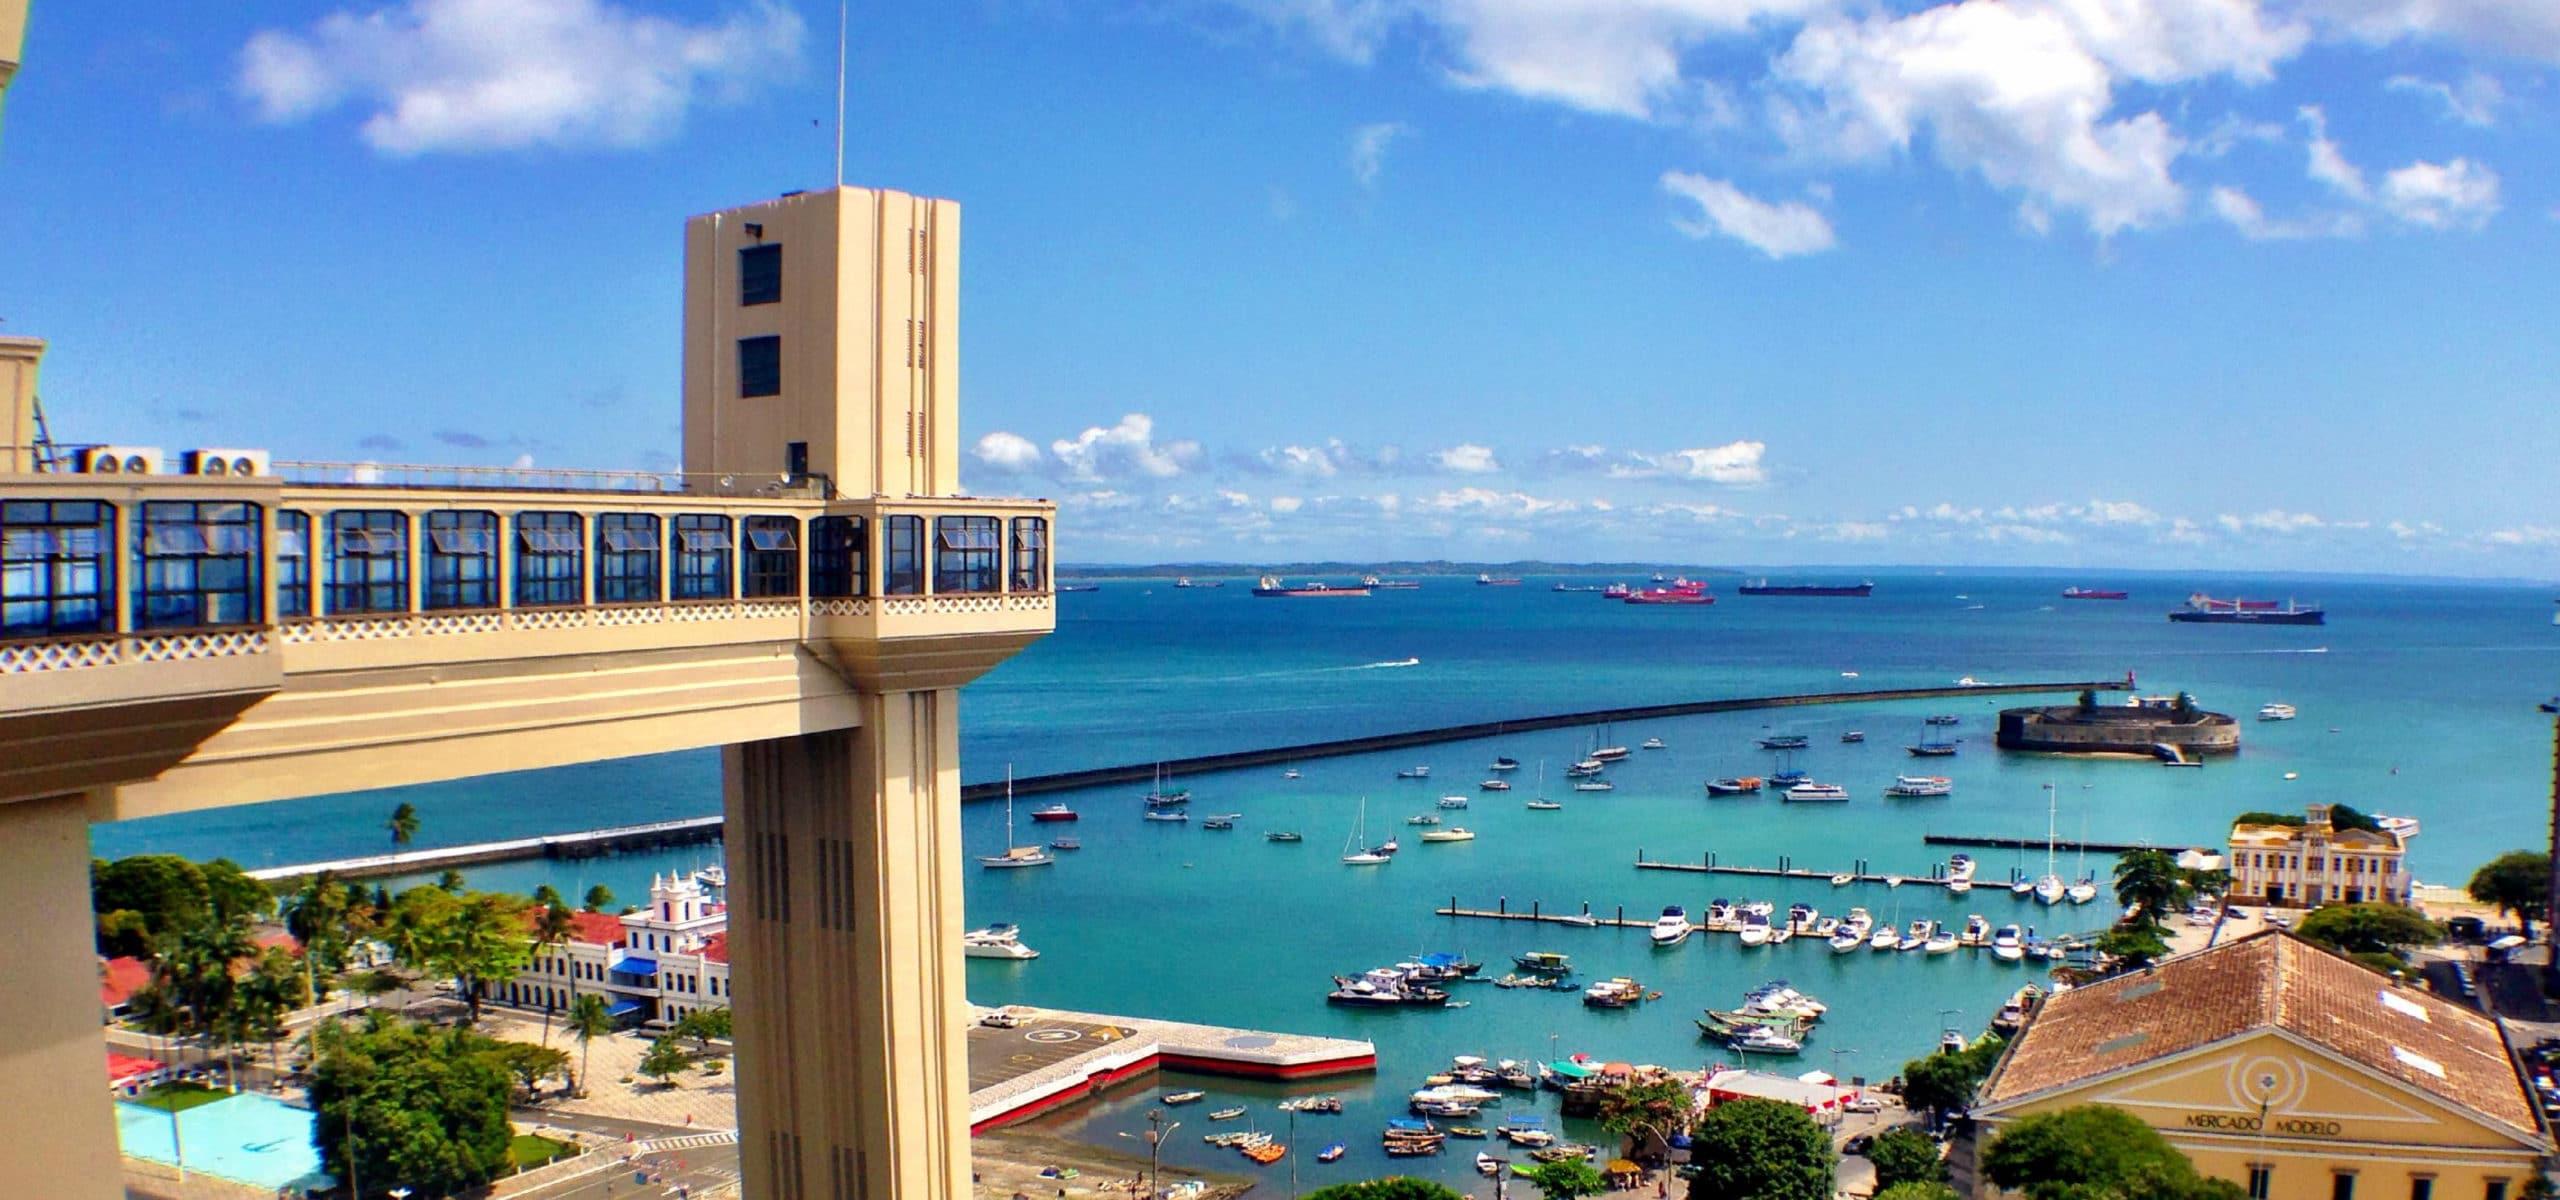 Salvador de Bahia, What to see in Salvador? - RipioTurismo DMC for Brazil